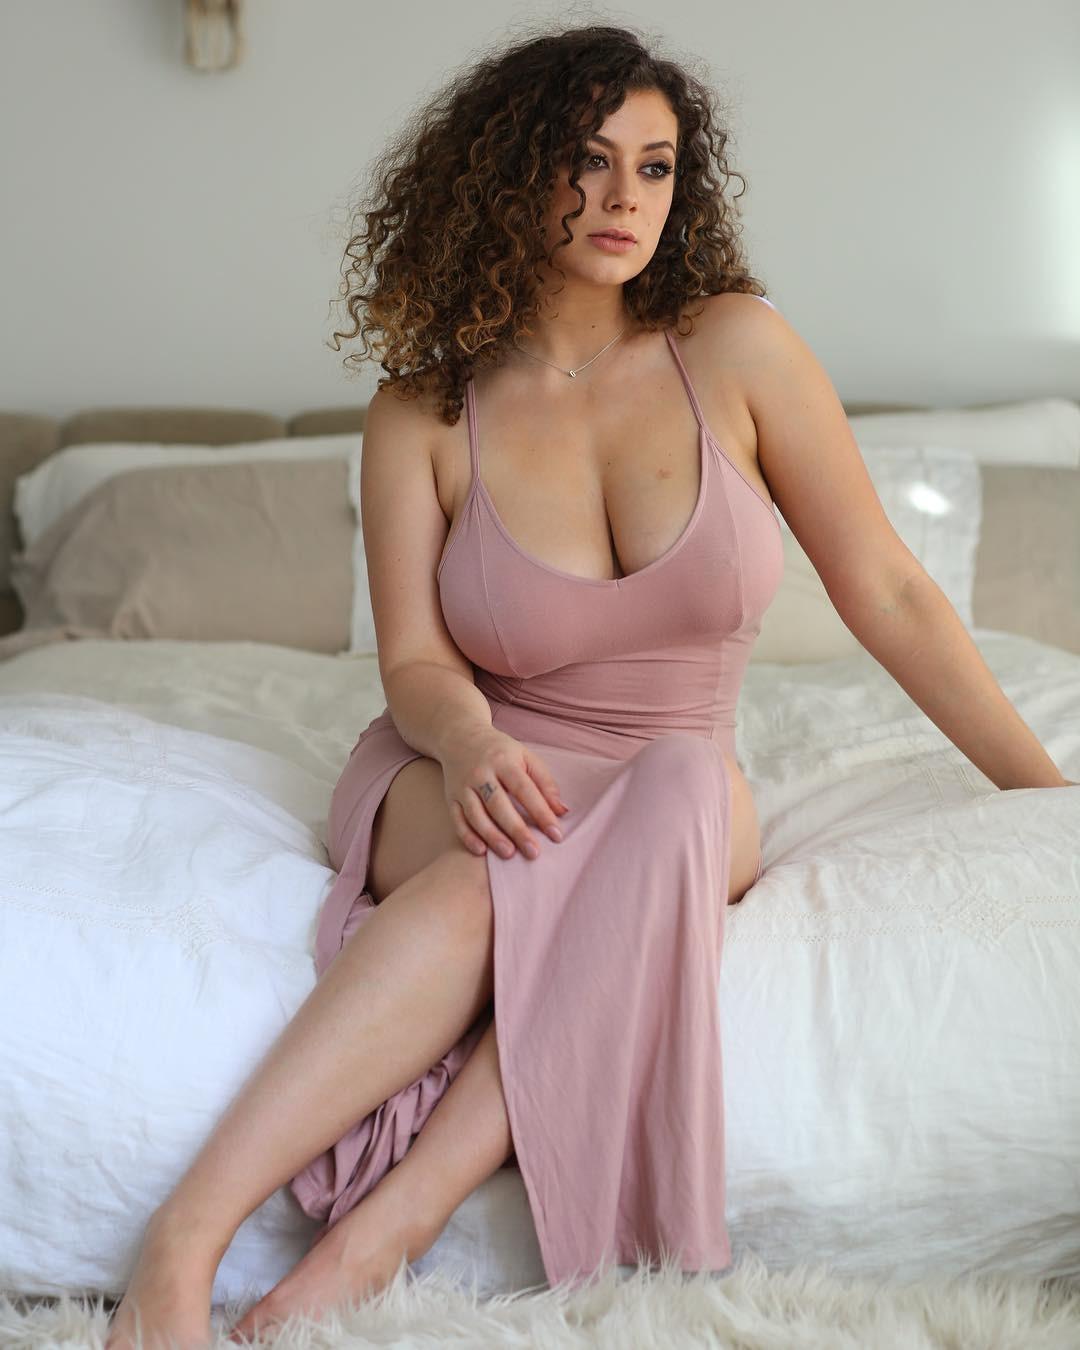 Leila Lowfire Video